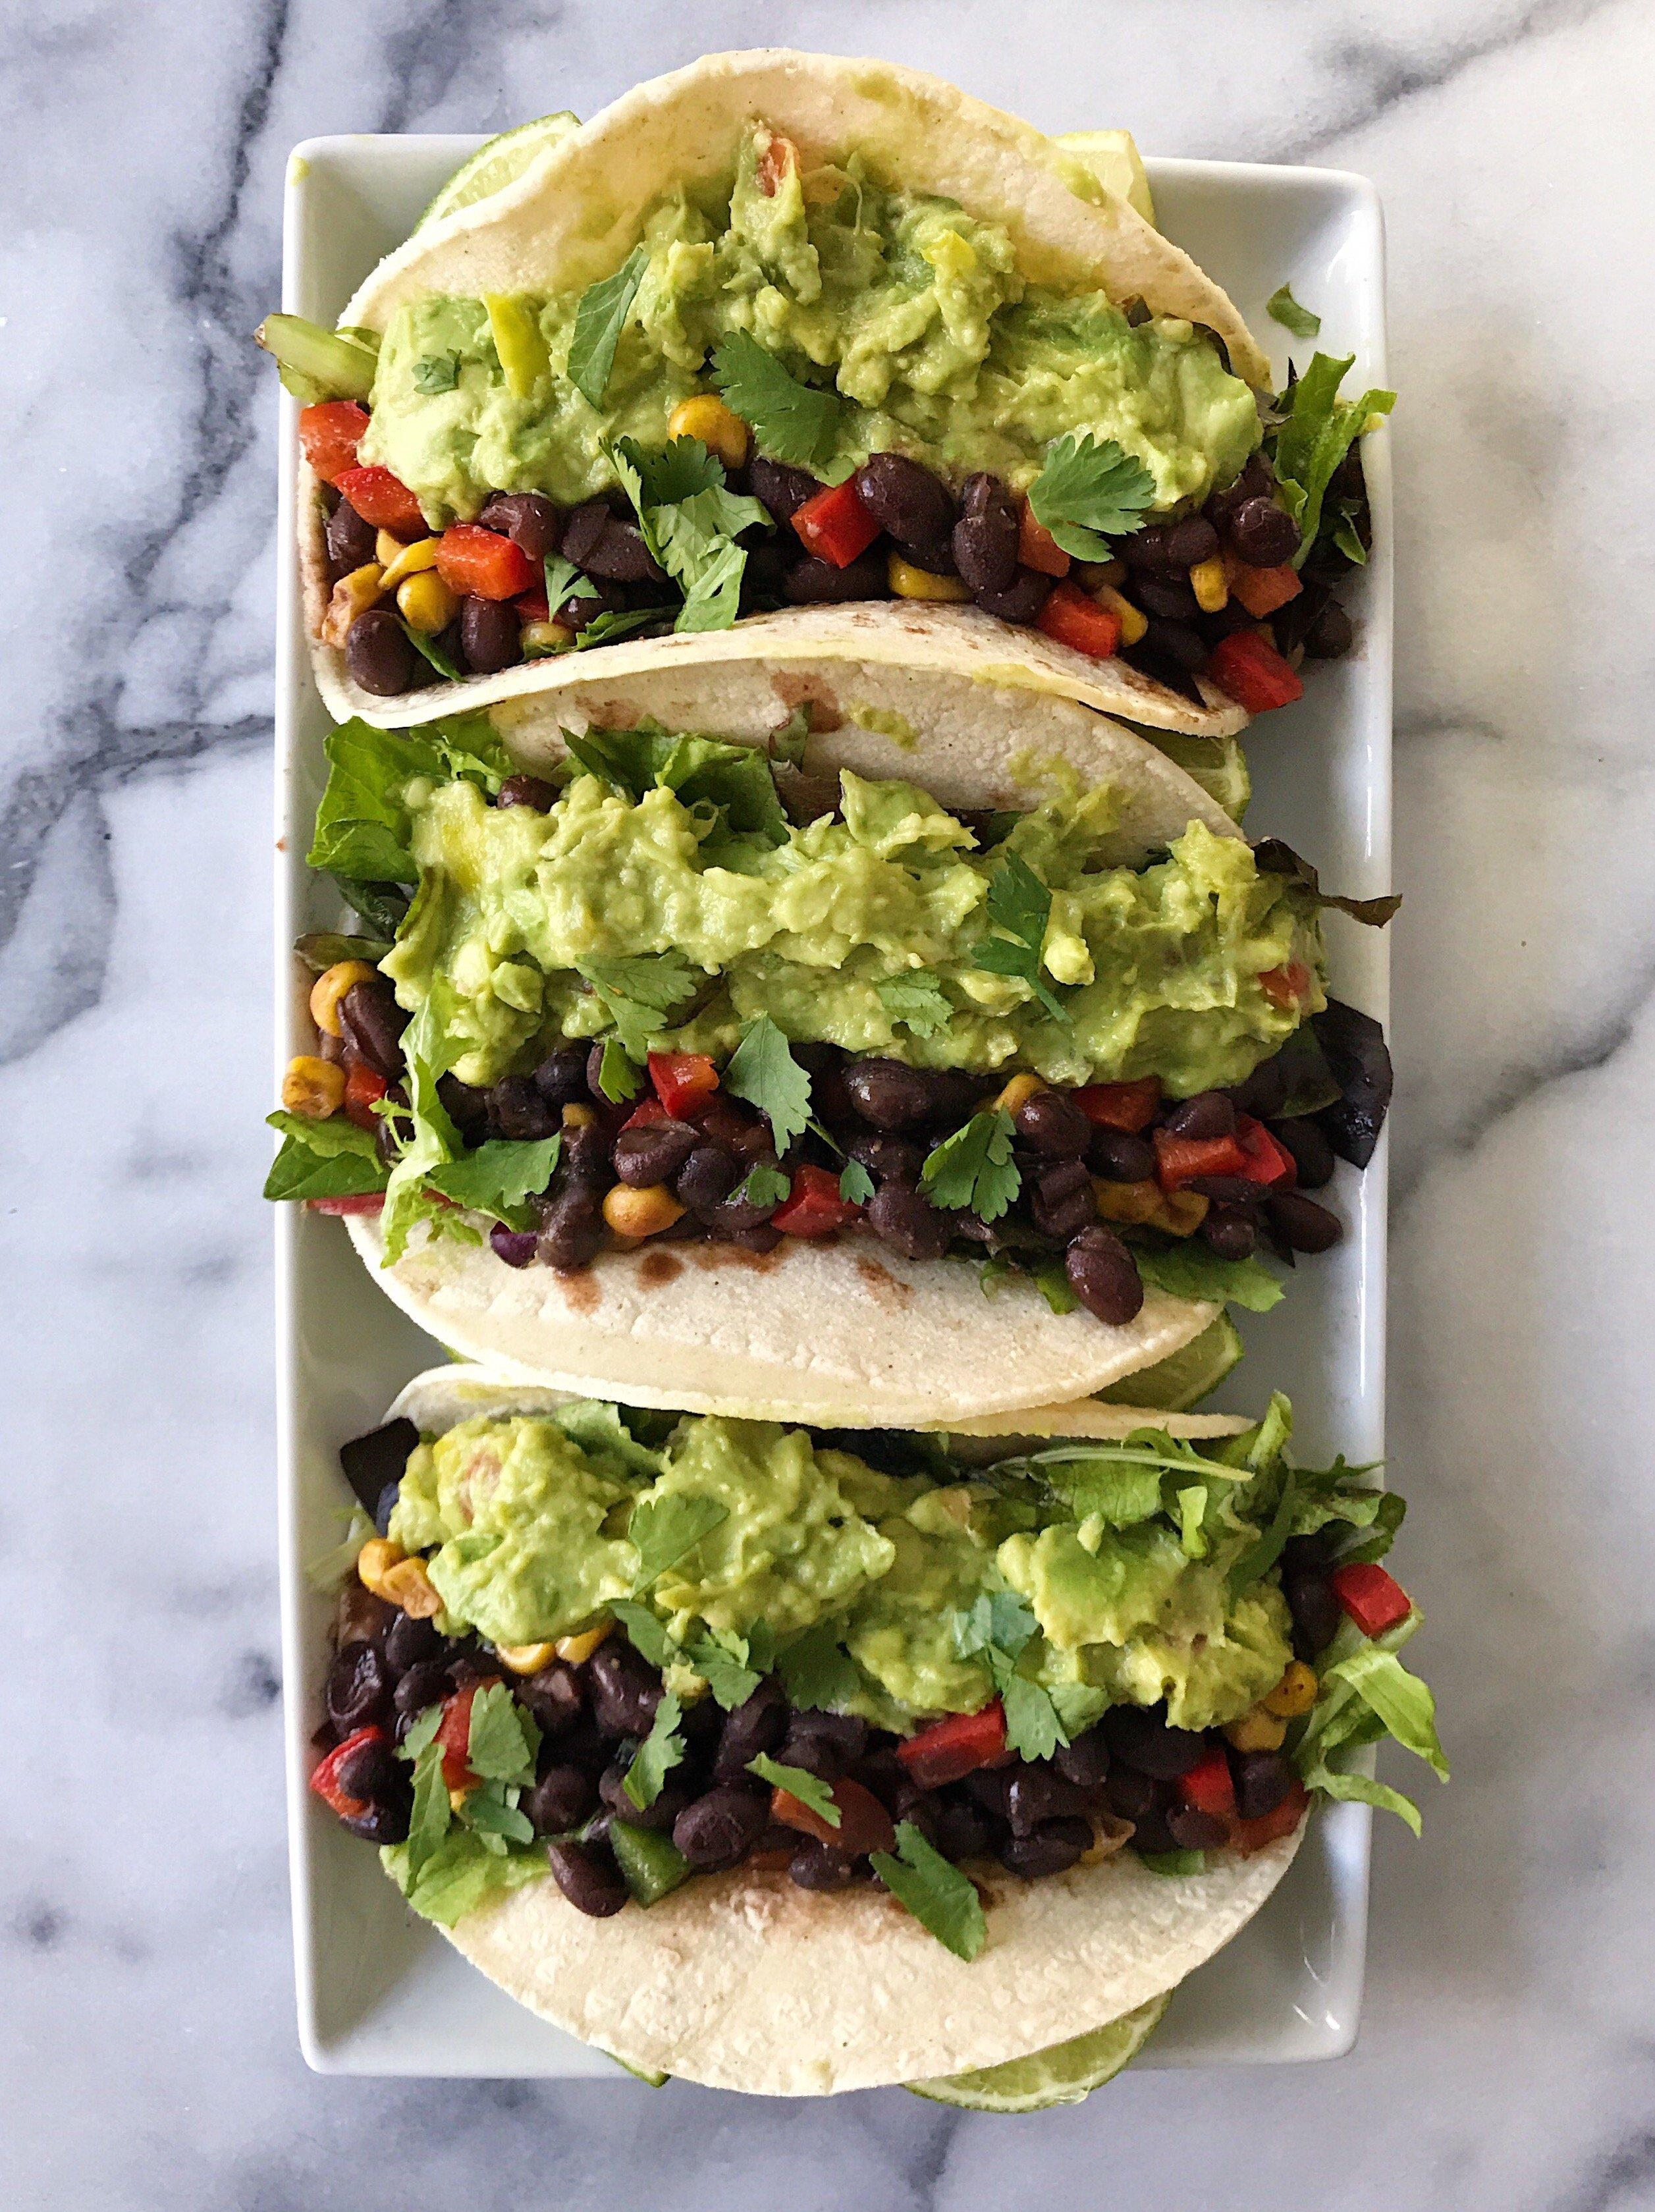 black bean tacos gluten free #glutenfreerecipes www.healthygffamily.com